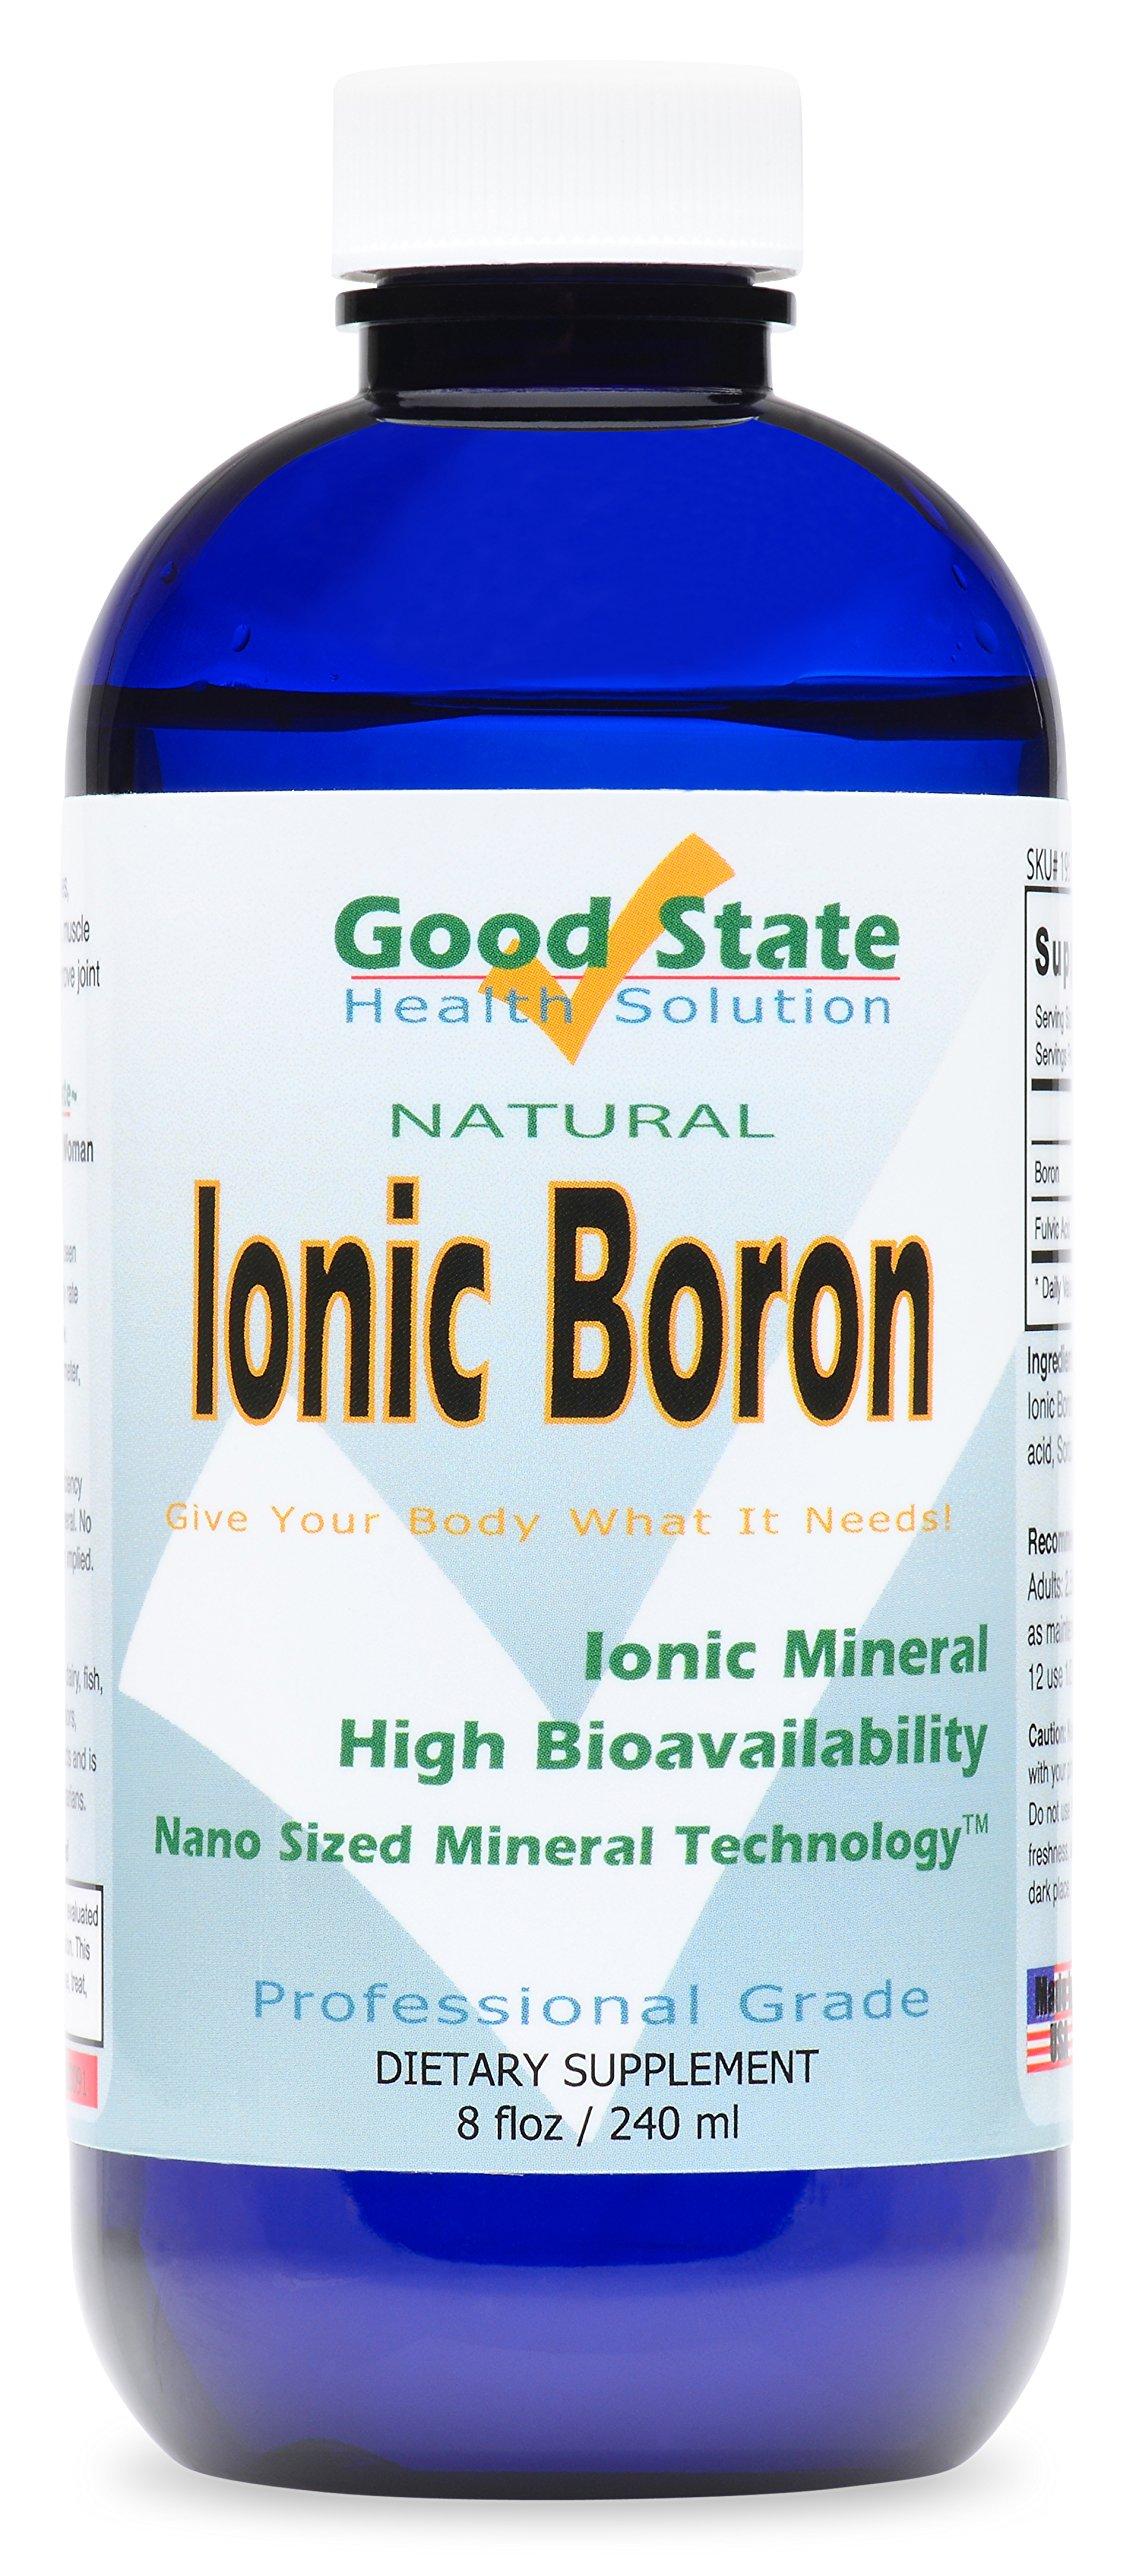 Good State Liquid Ionic Boron (96 servings at 5 mg, plus 2 mg fulvic acid - 8 fl oz)